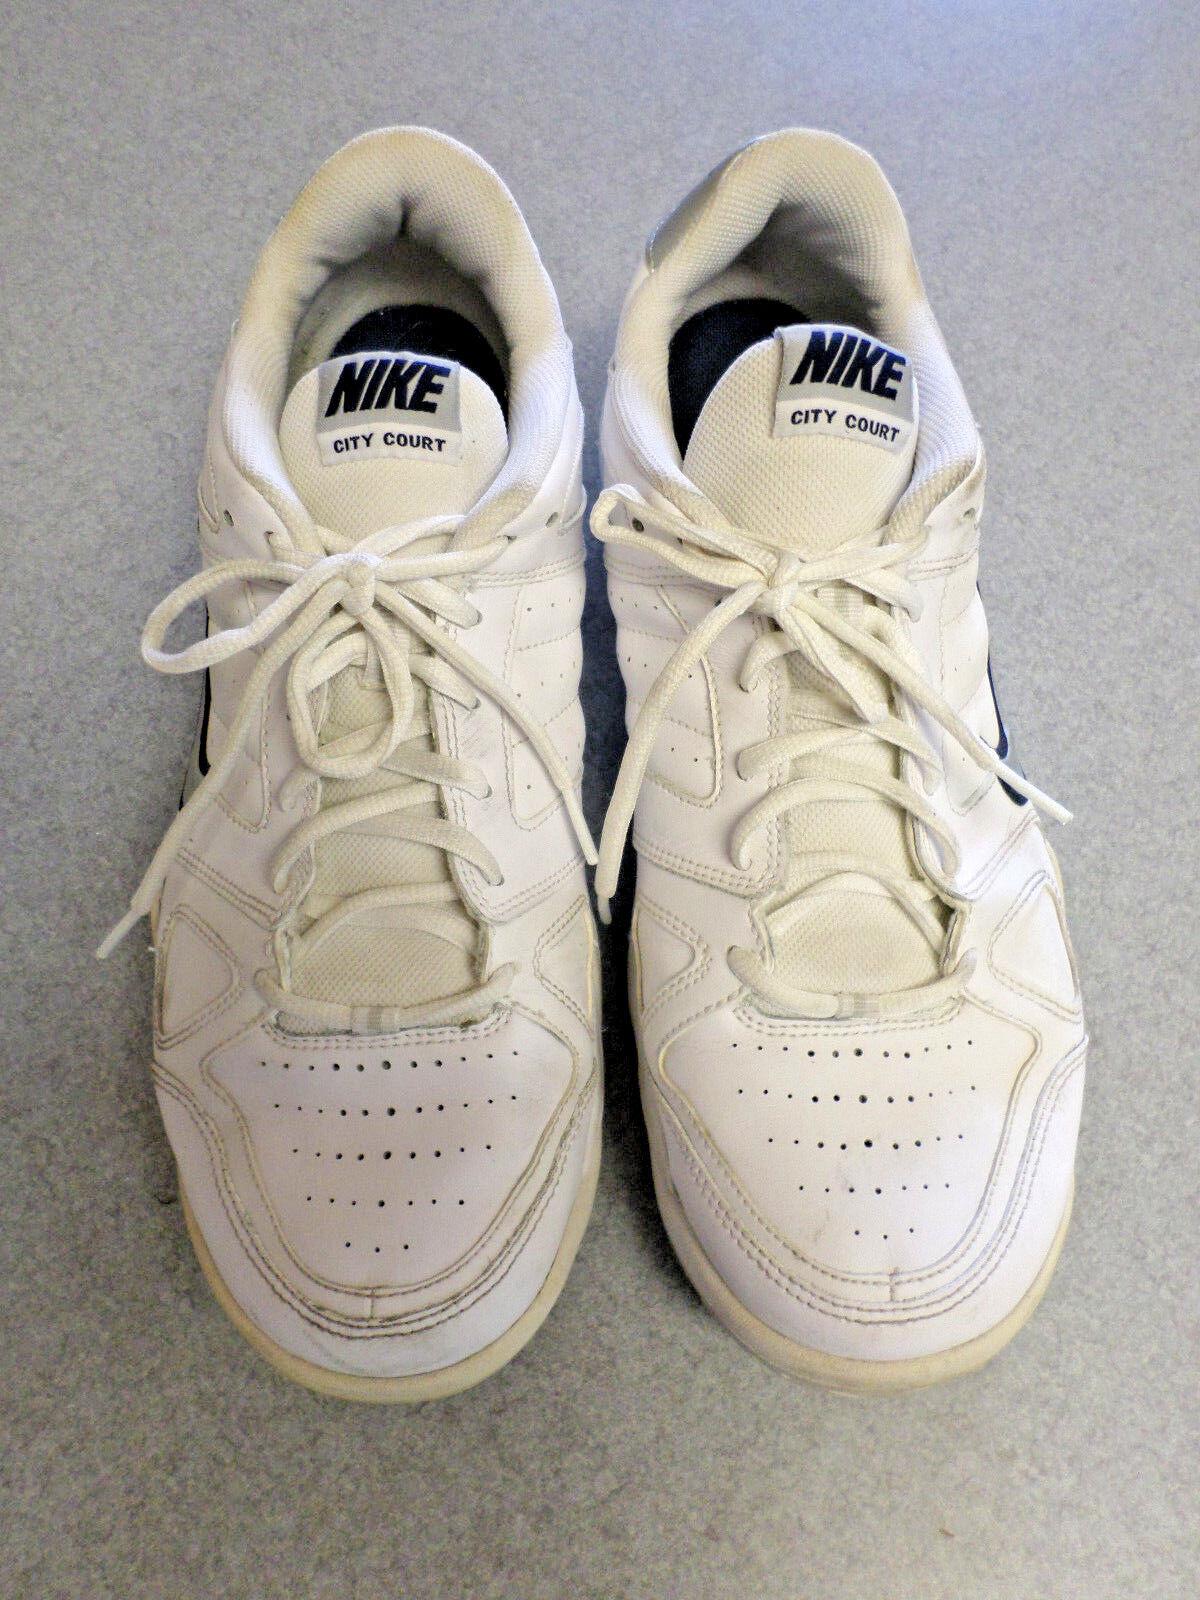 1dbb7a537727 Nike